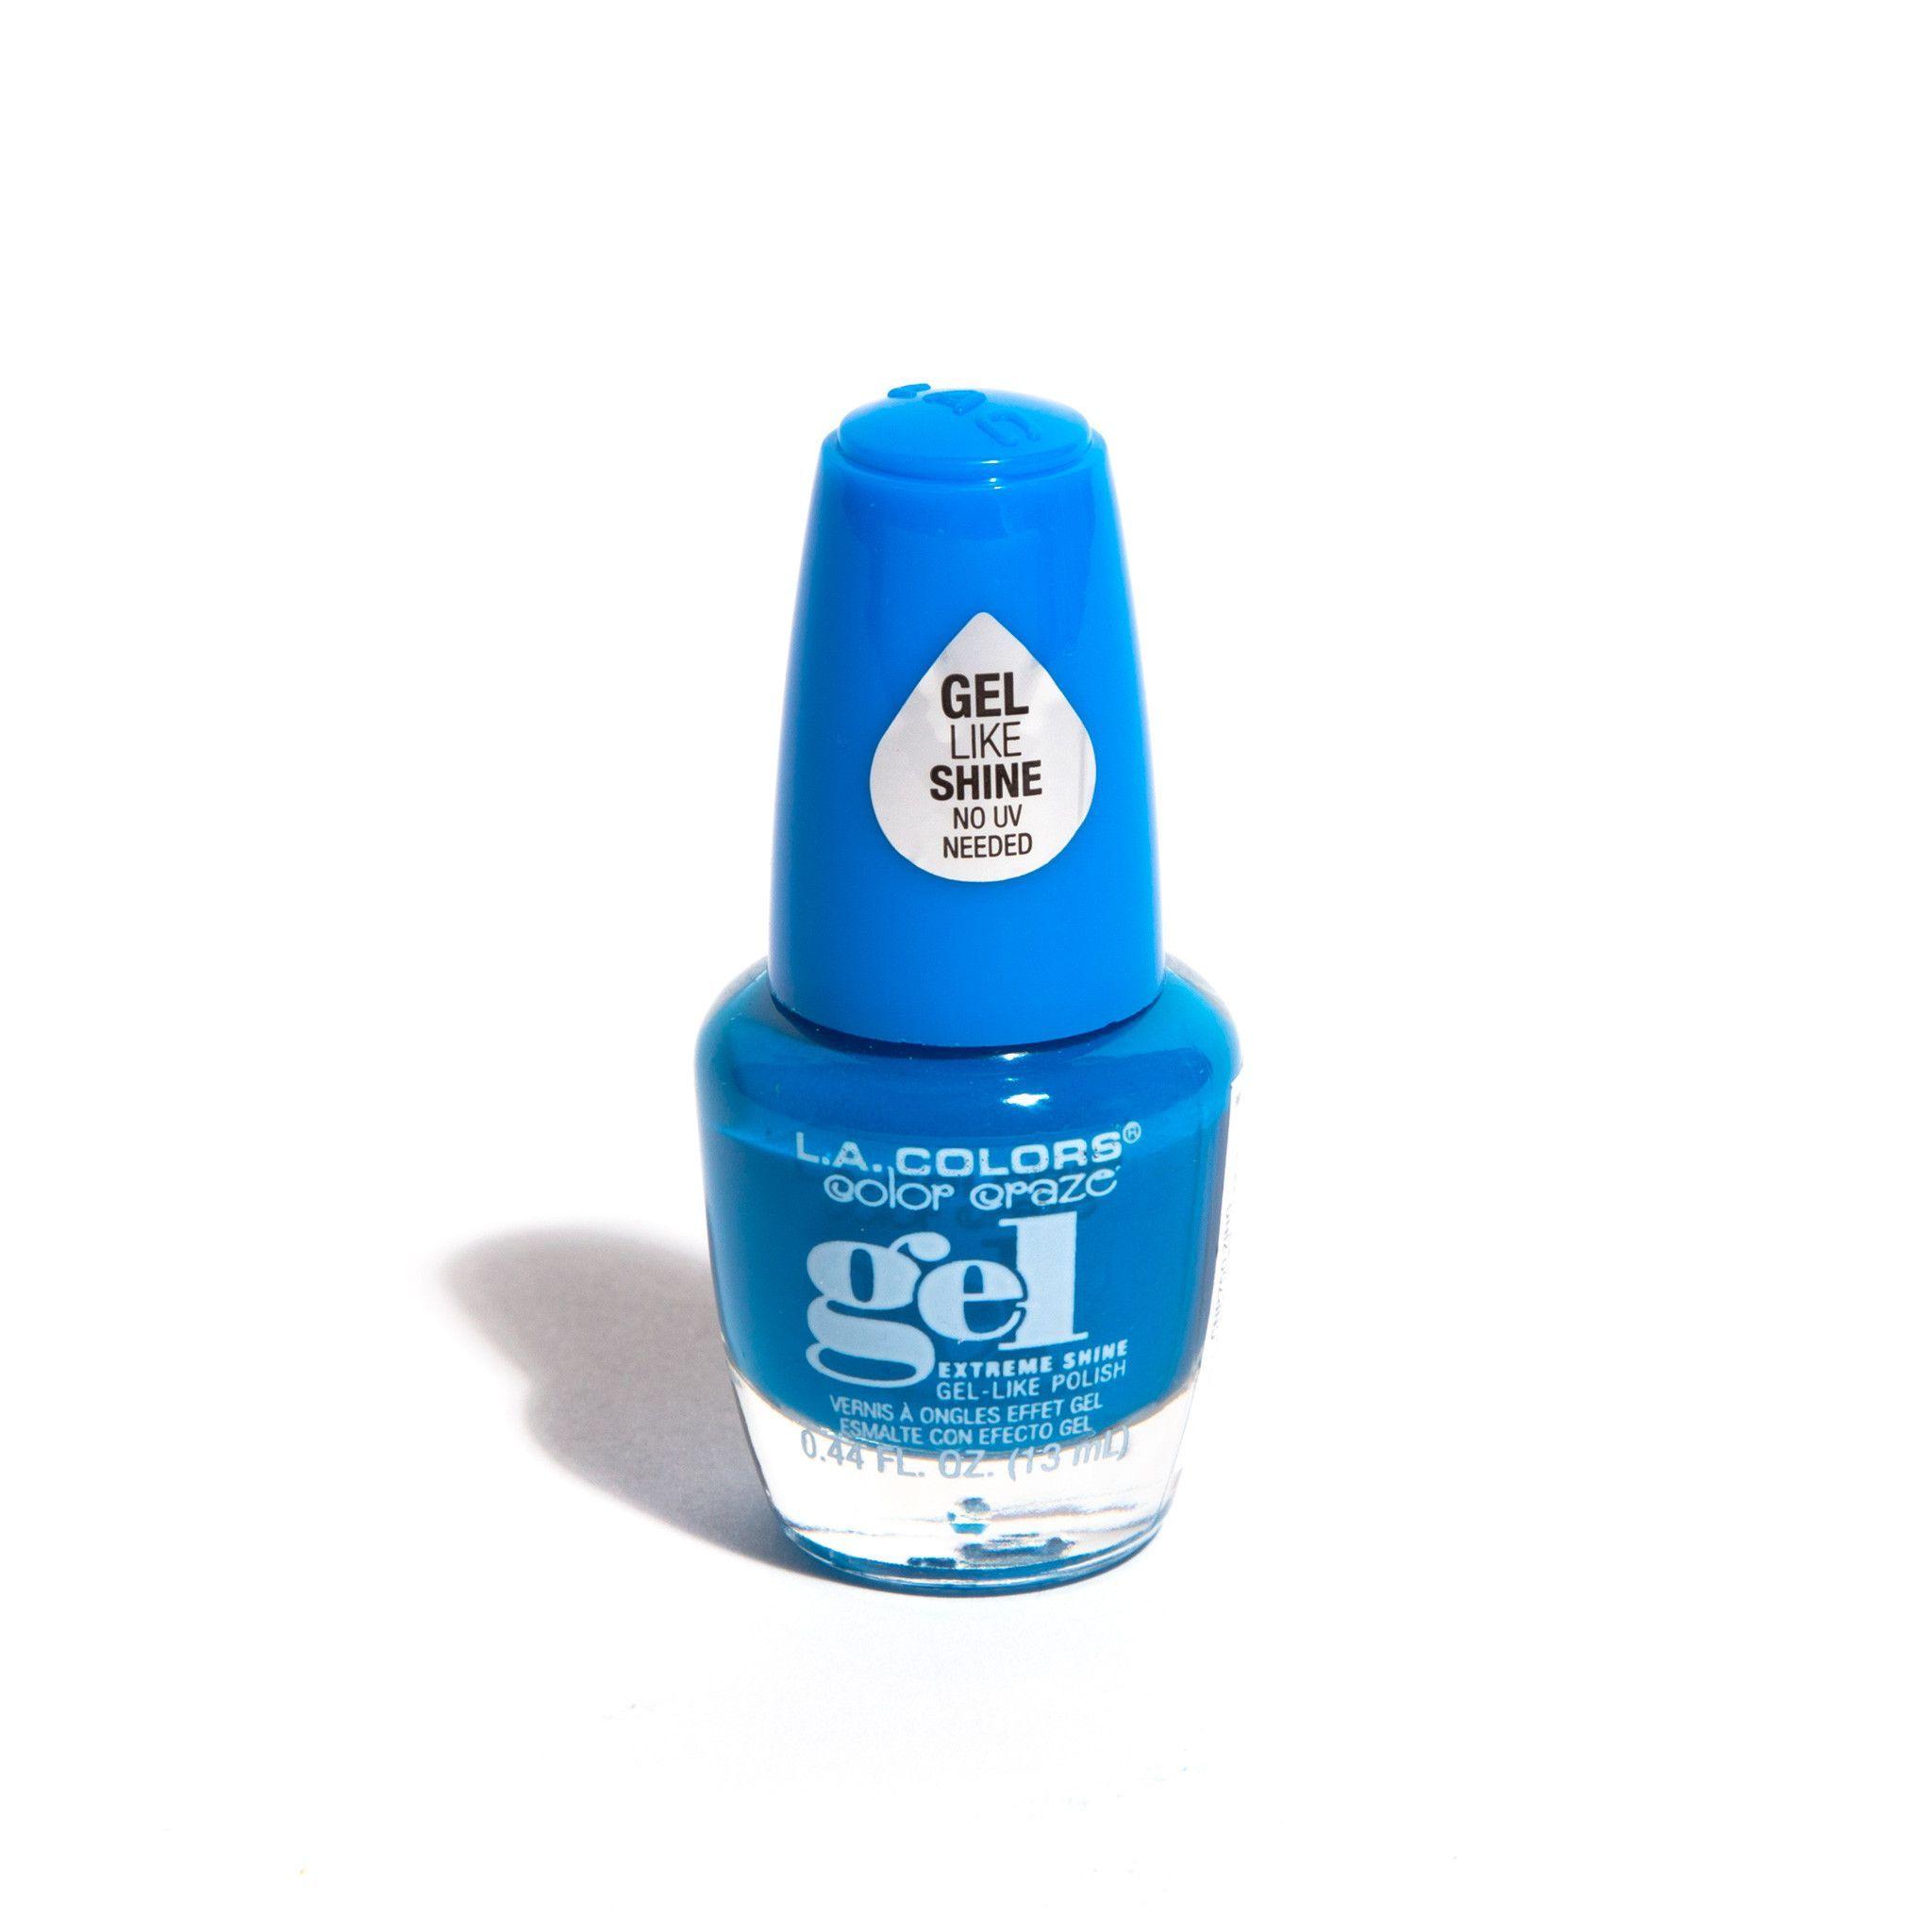 Extreme Shine Gel Polish - Zing | Products | Pinterest | La colors ...